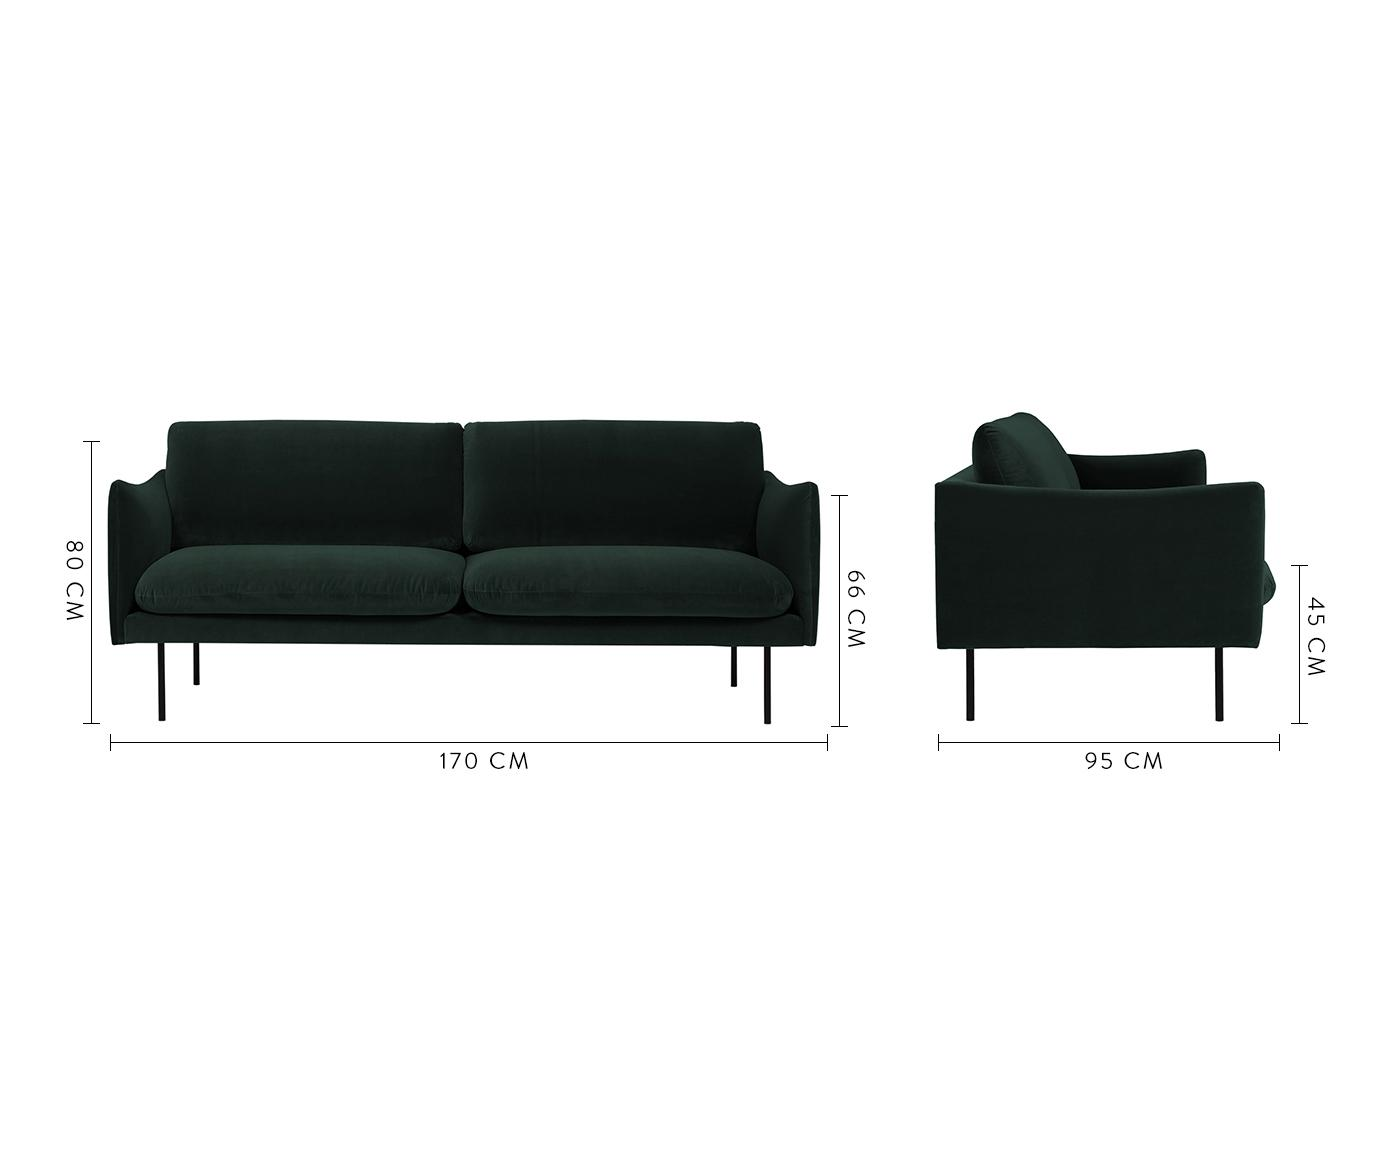 Samt-Sofa Moby (2-Sitzer), Bezug: Samt (Hochwertiger Polyes, Gestell: Massives Kiefernholz, Füße: Metall, pulverbeschichtet, Samt Dunkelgrün, B 170 x T 95 cm